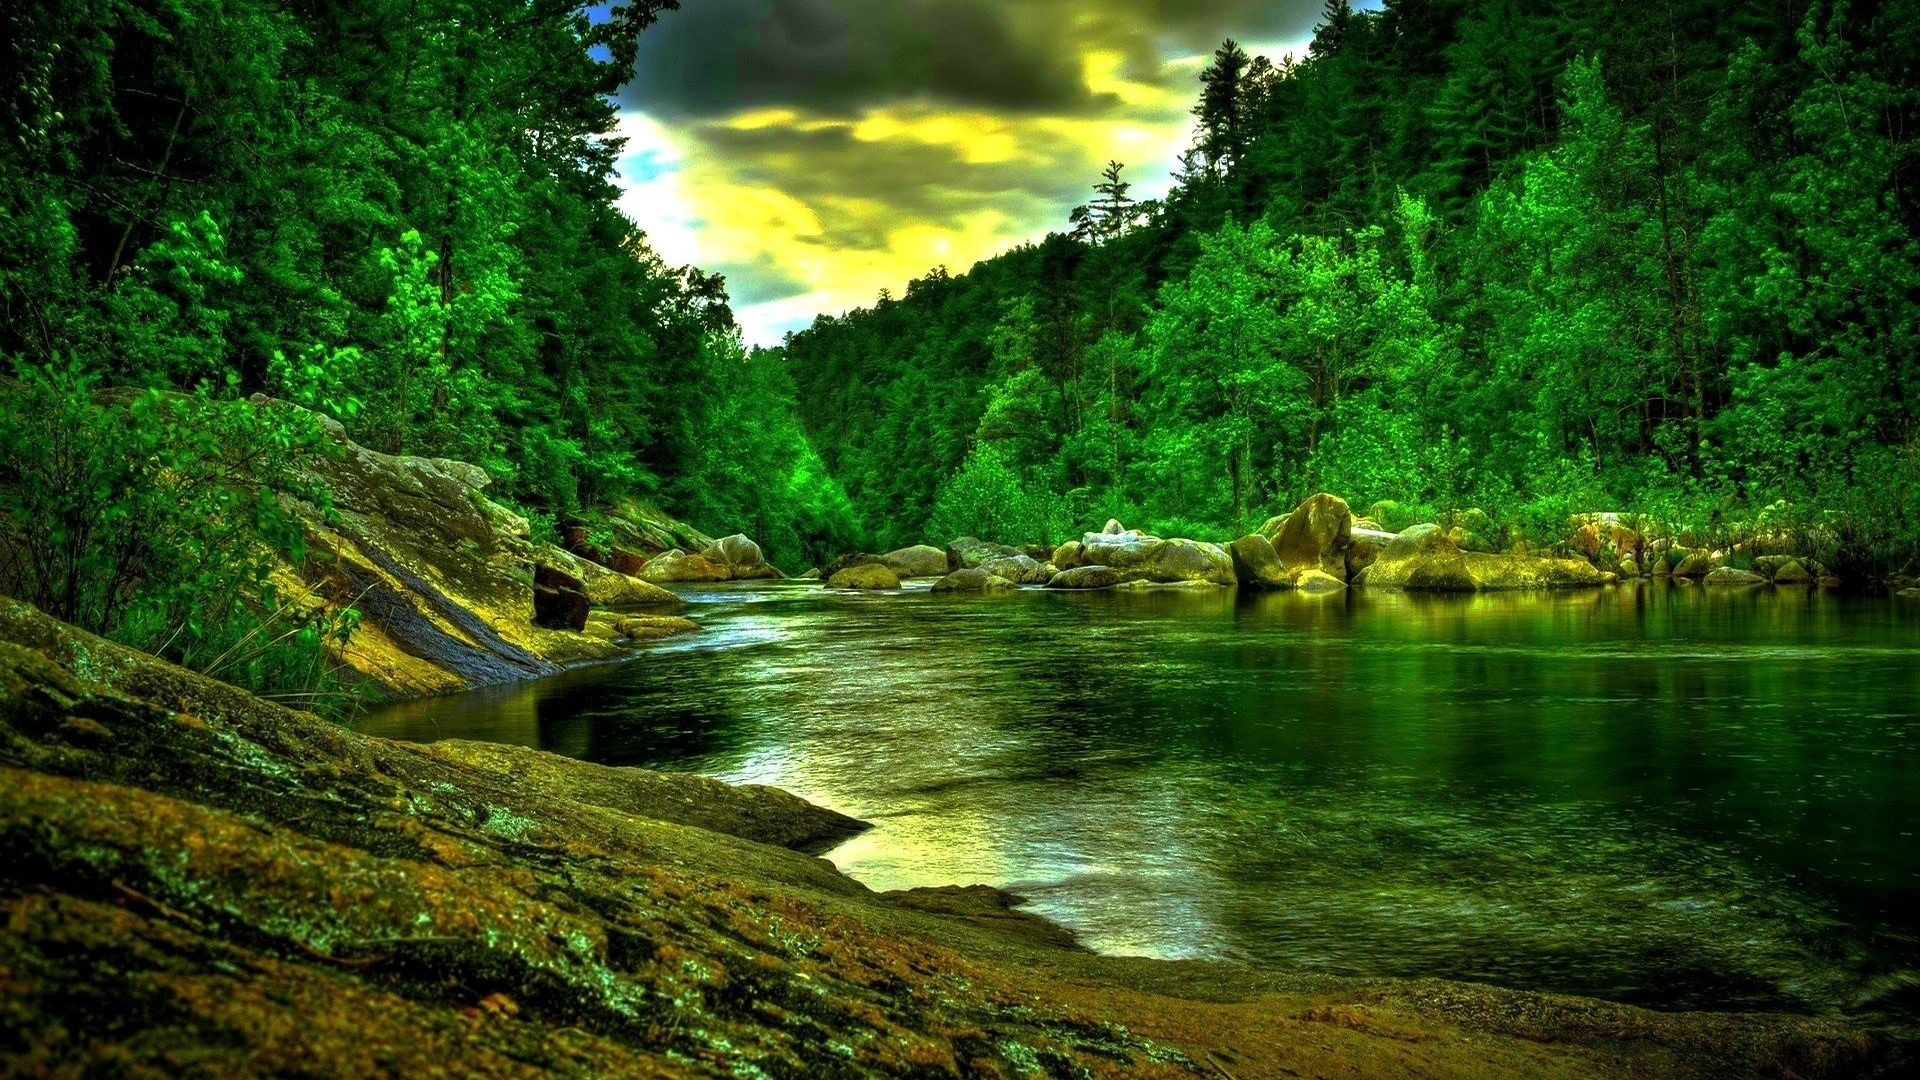 Full Hd Nature Wallpapers Top Free Full Hd Nature